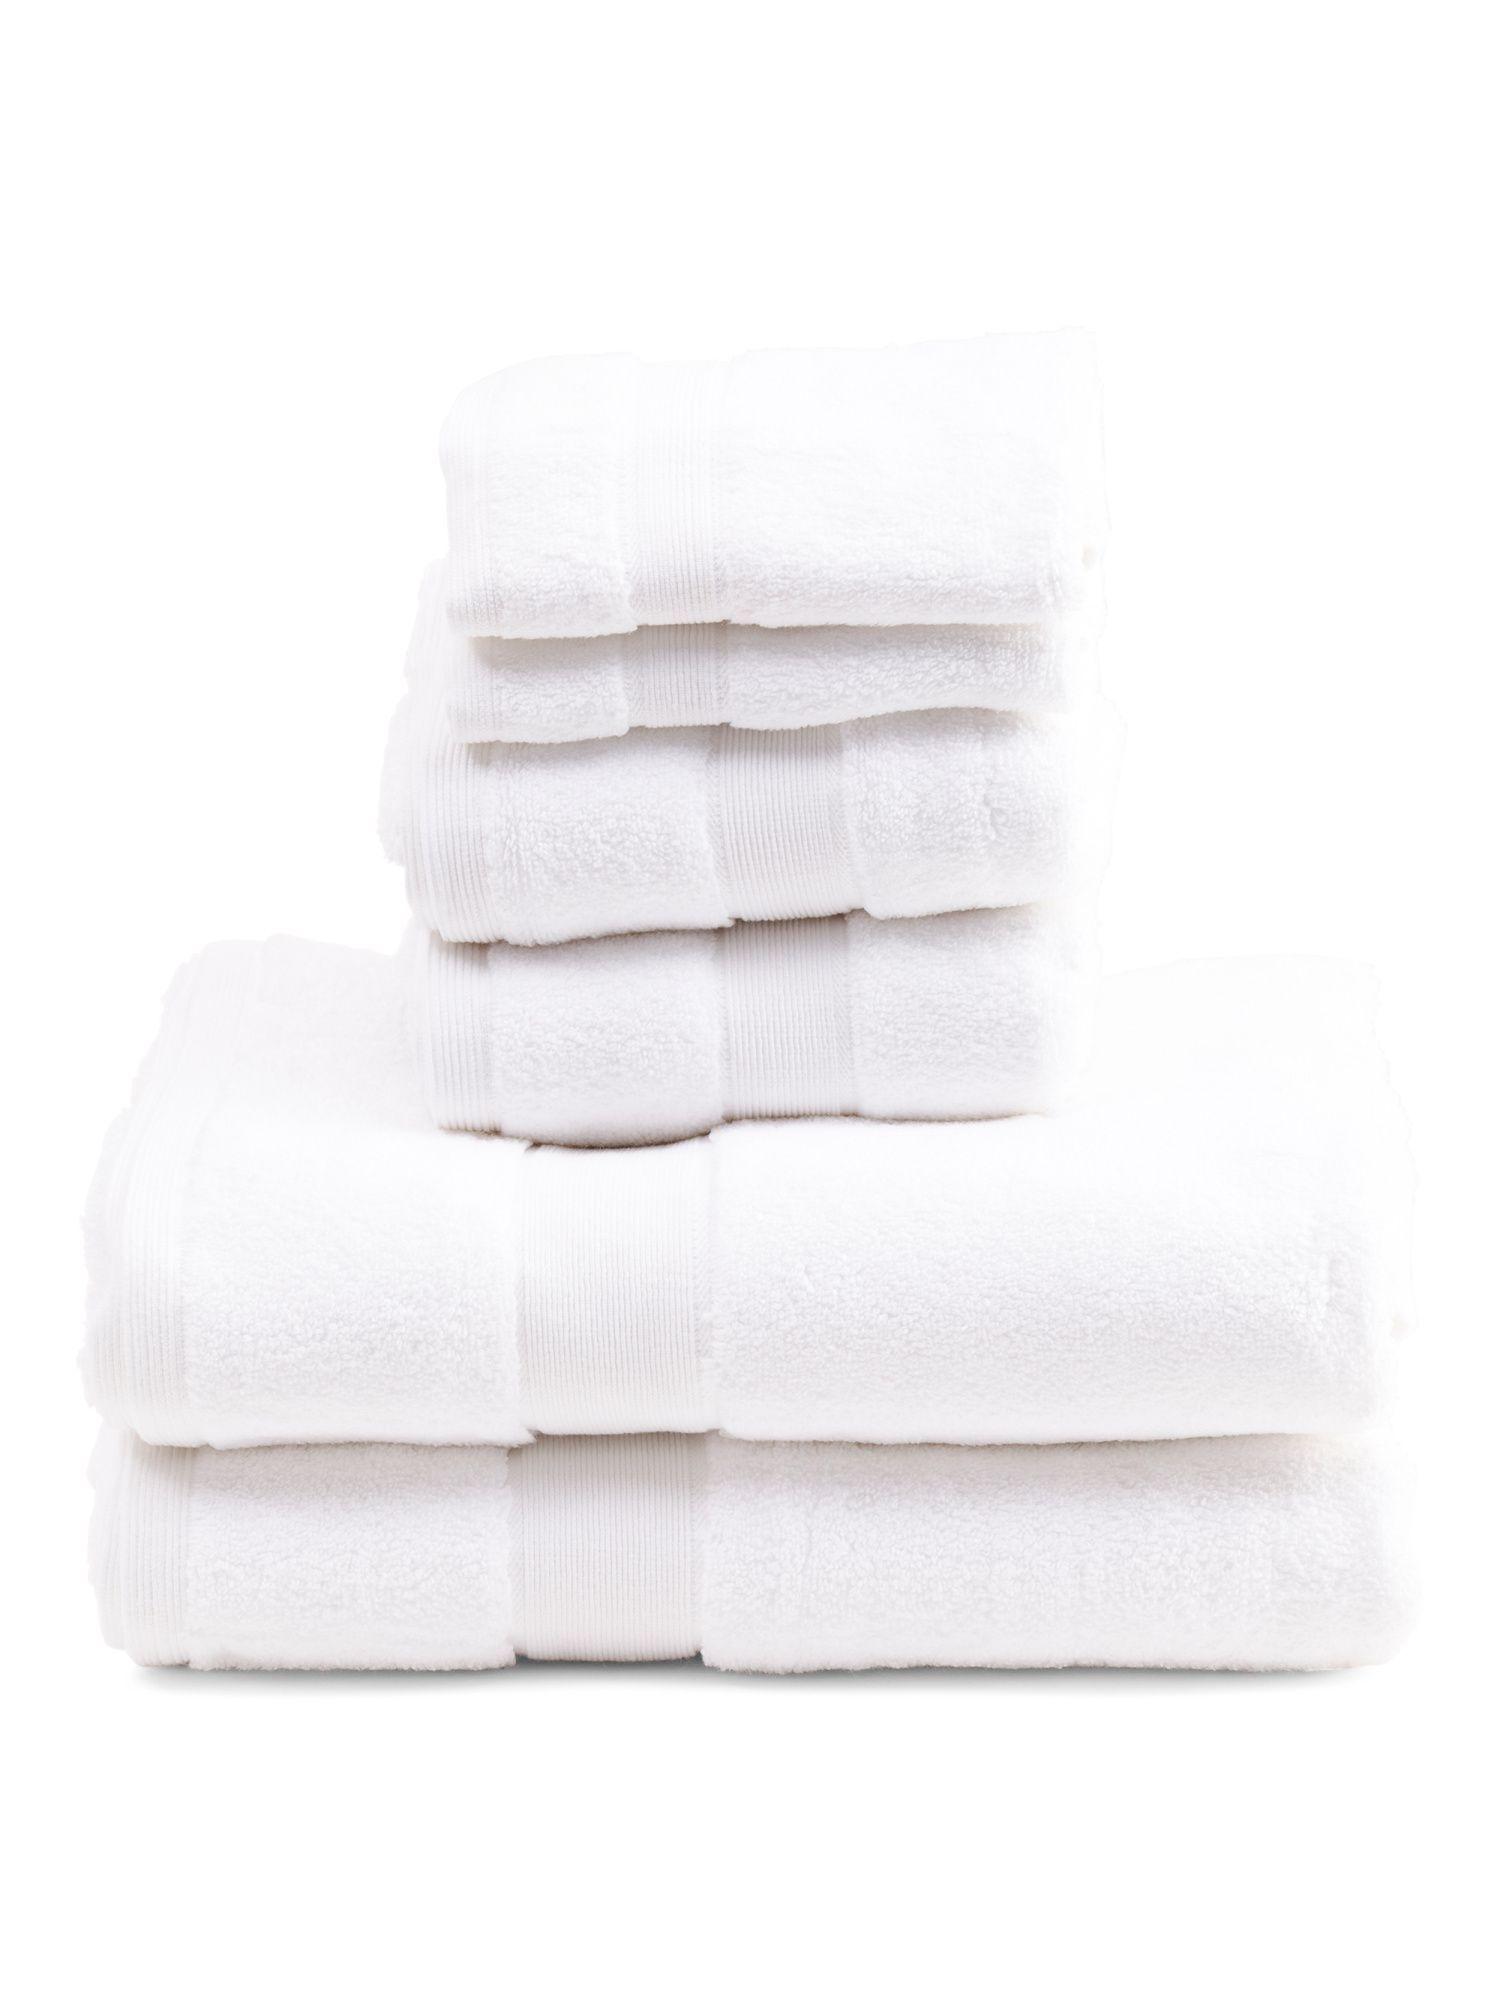 Made In India 6pc Heavyweight Towel Set Towel Set Towel India